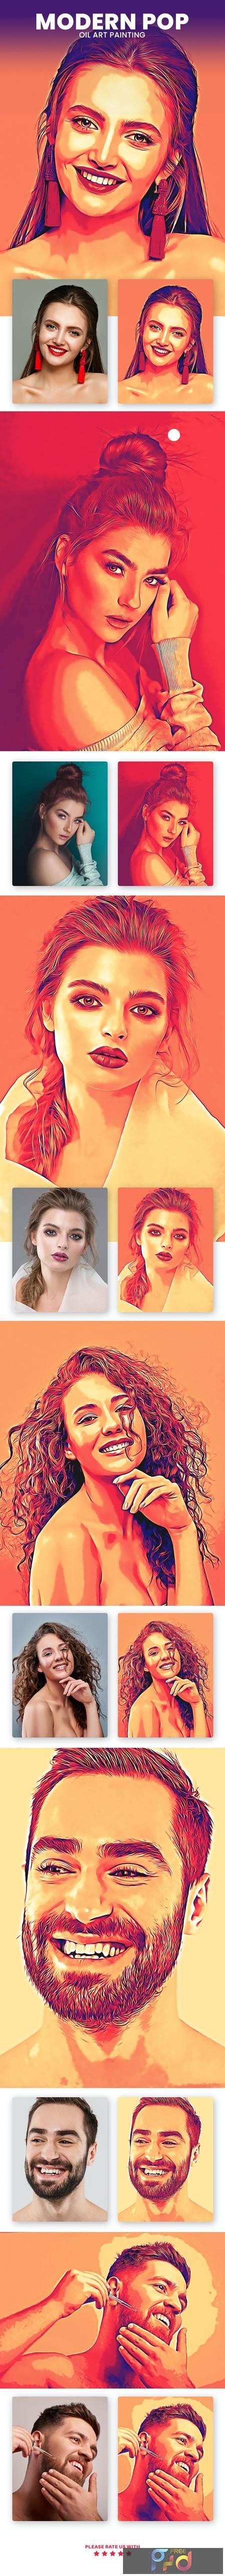 Modern Pop Oil Art Painting 30496322 1